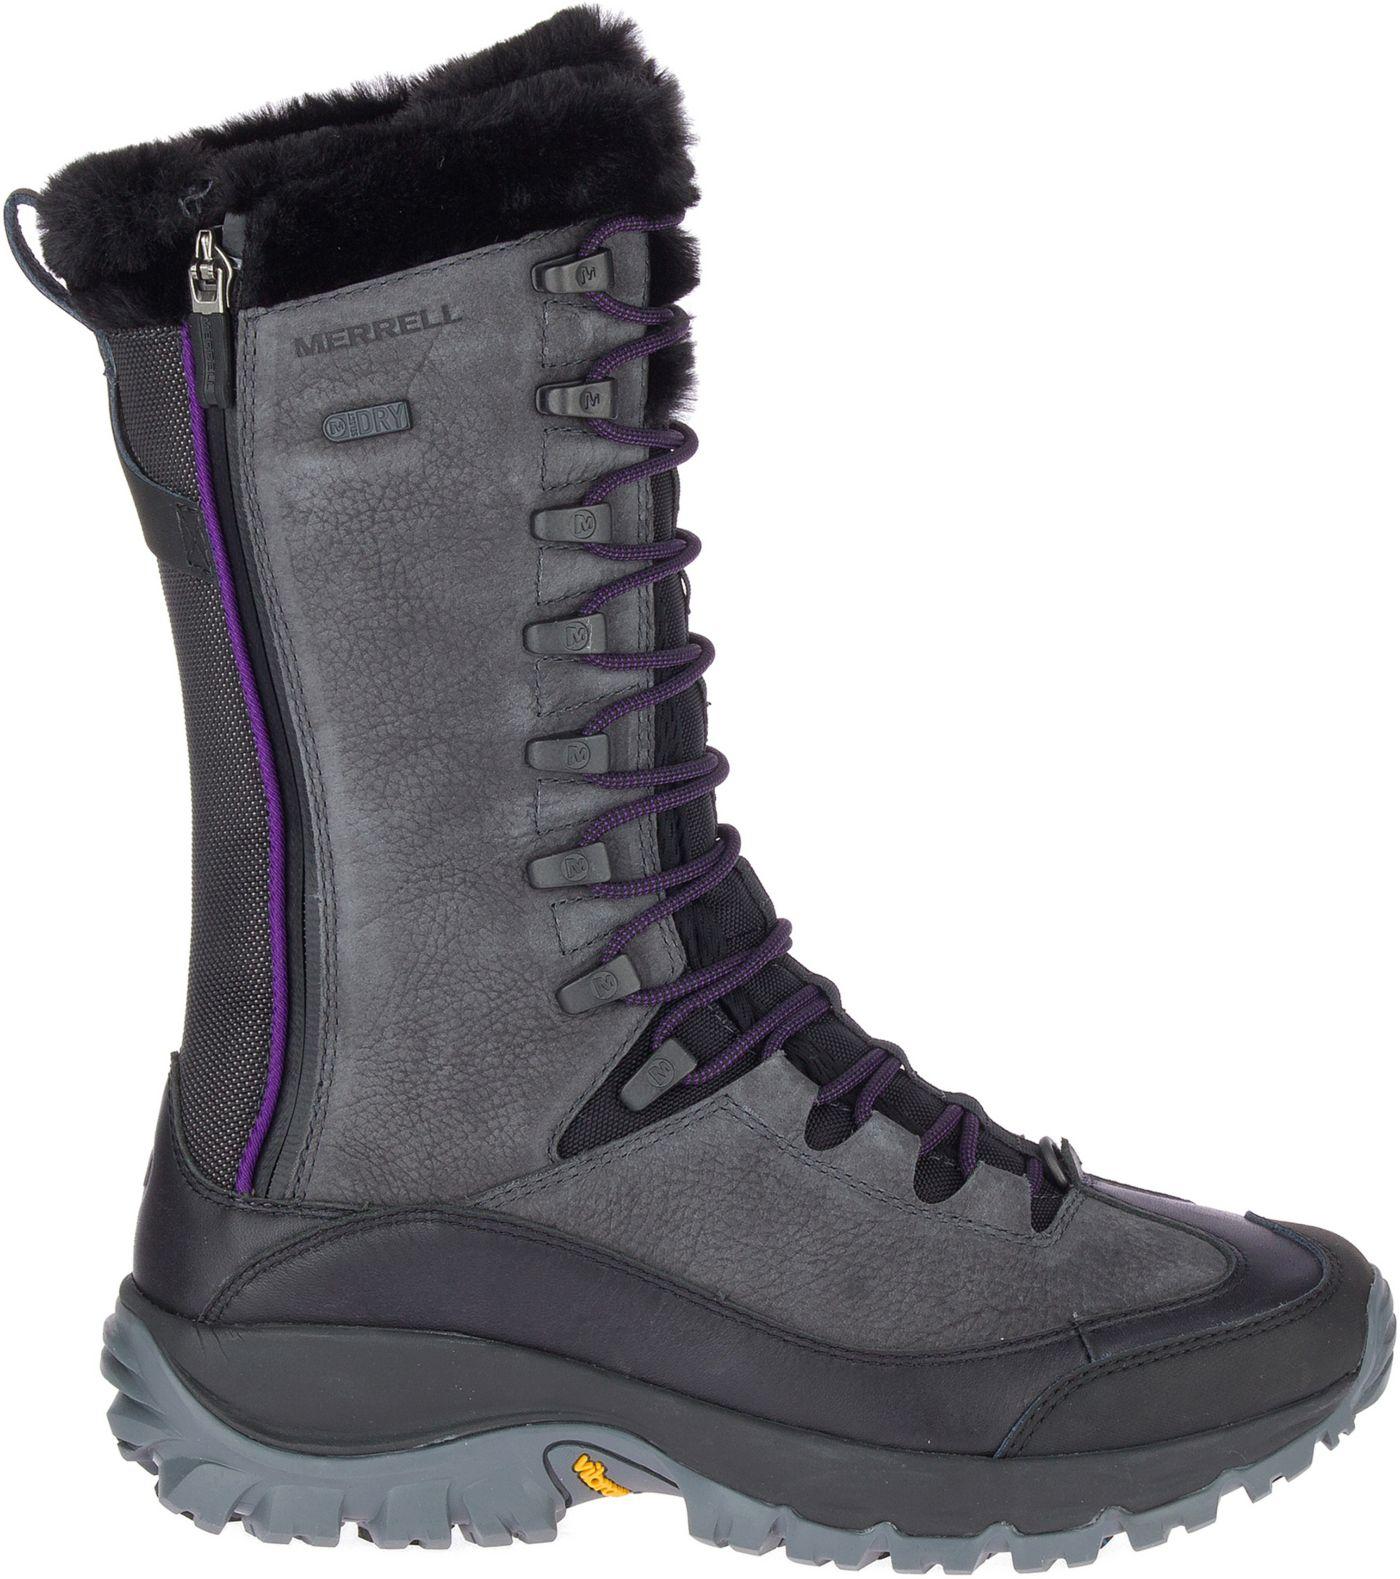 Merrell Women's Thermo Rhea Tall 200g Waterproof Hiking Boots